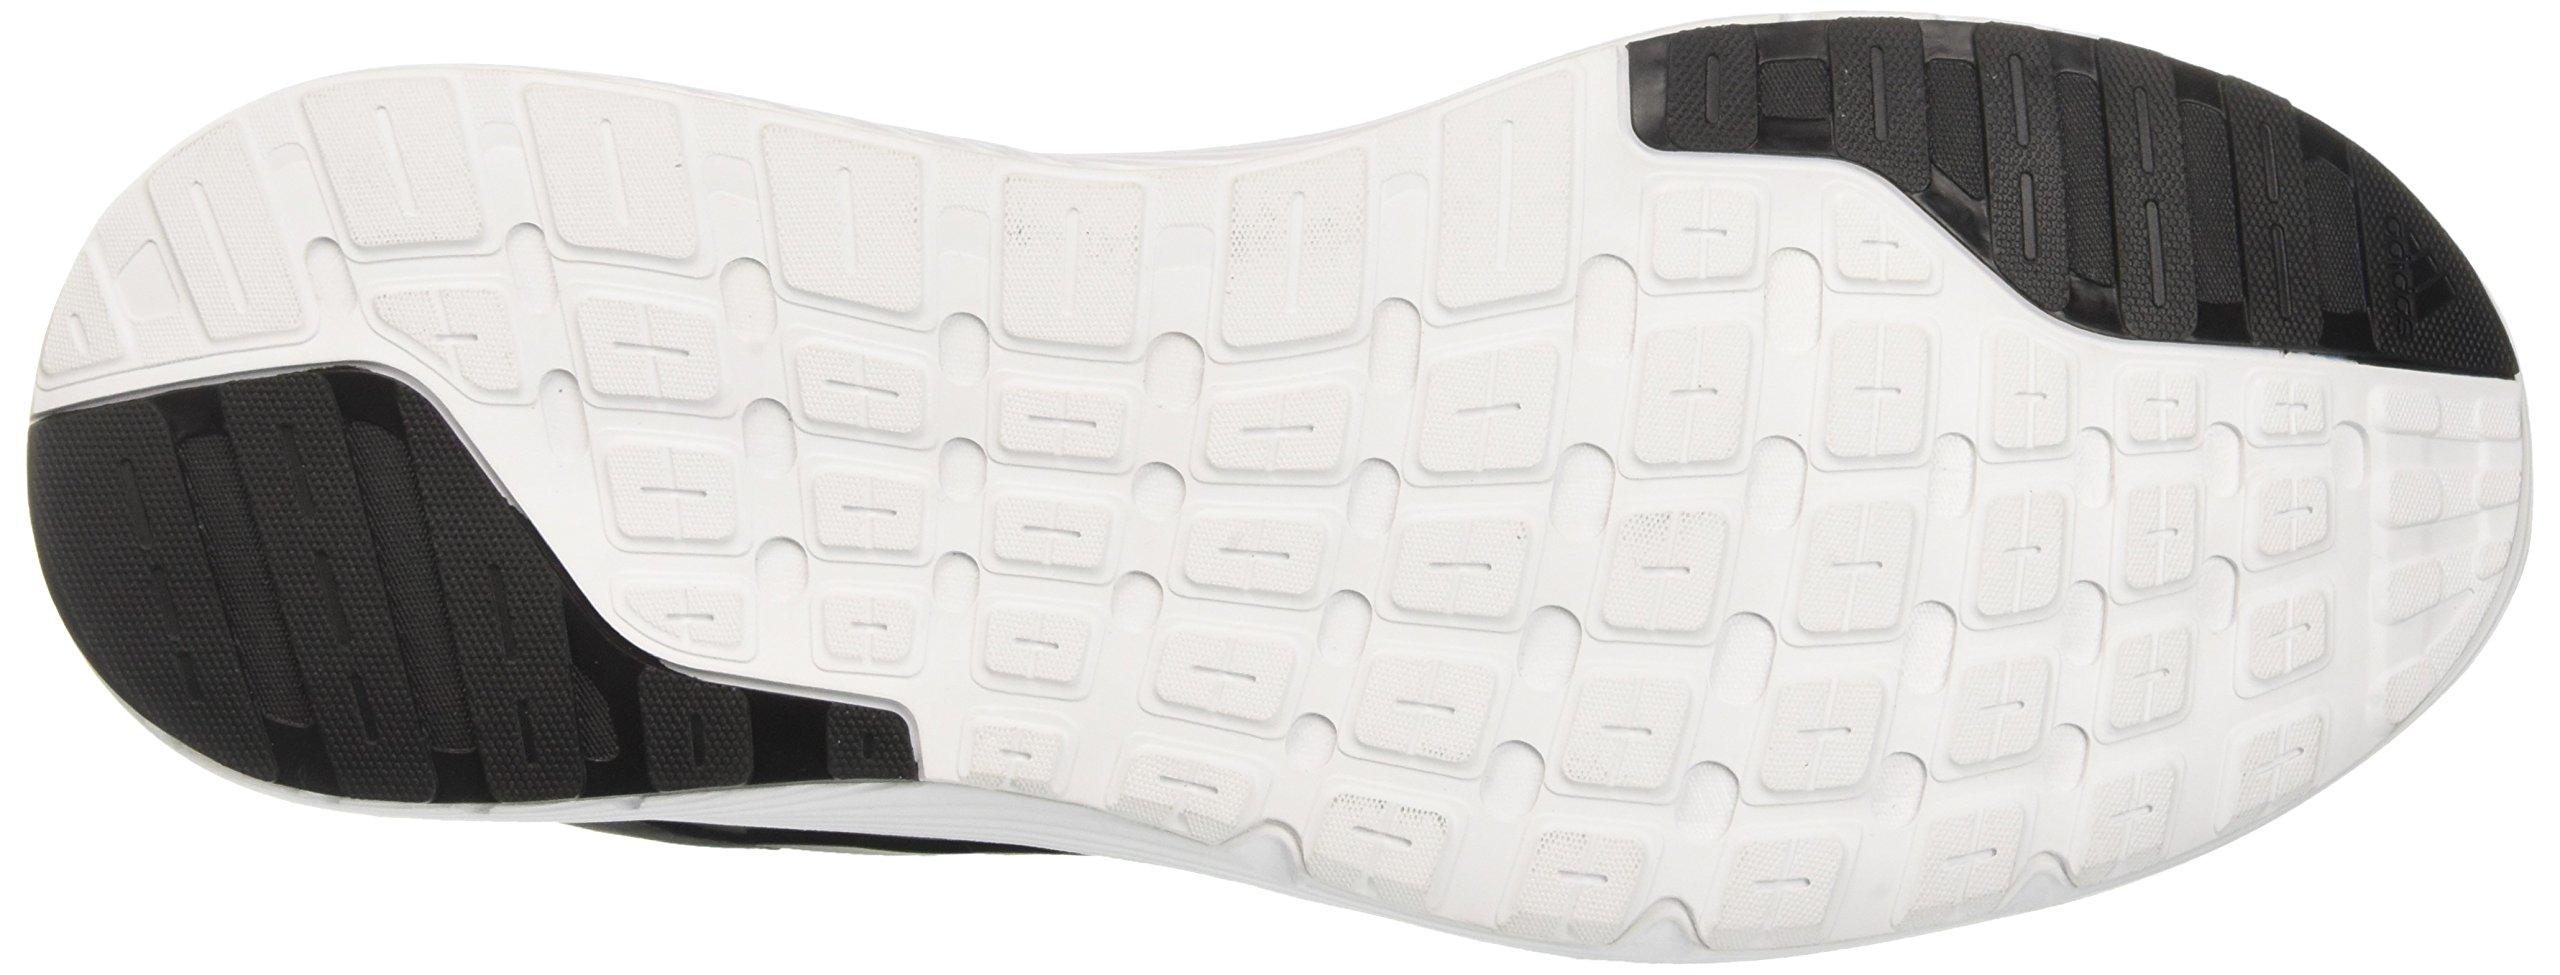 Adidas Galaxy 4 M, Scarpe da Running Uomo 3 spesavip